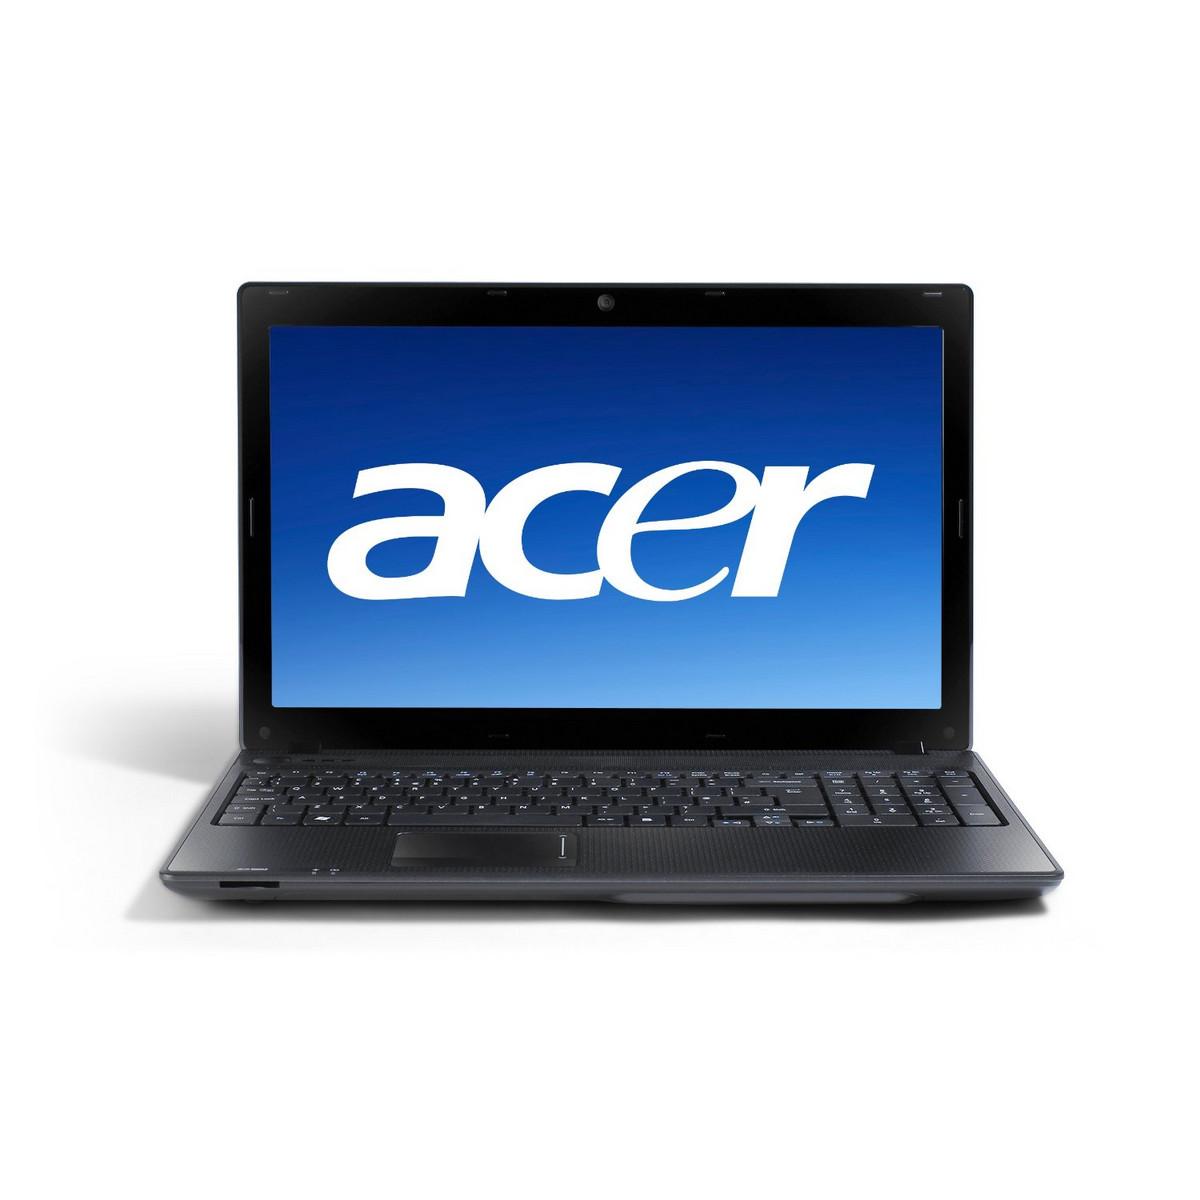 Acer Aspire 5742ZG NVIDIA Graphics Drivers (2019)